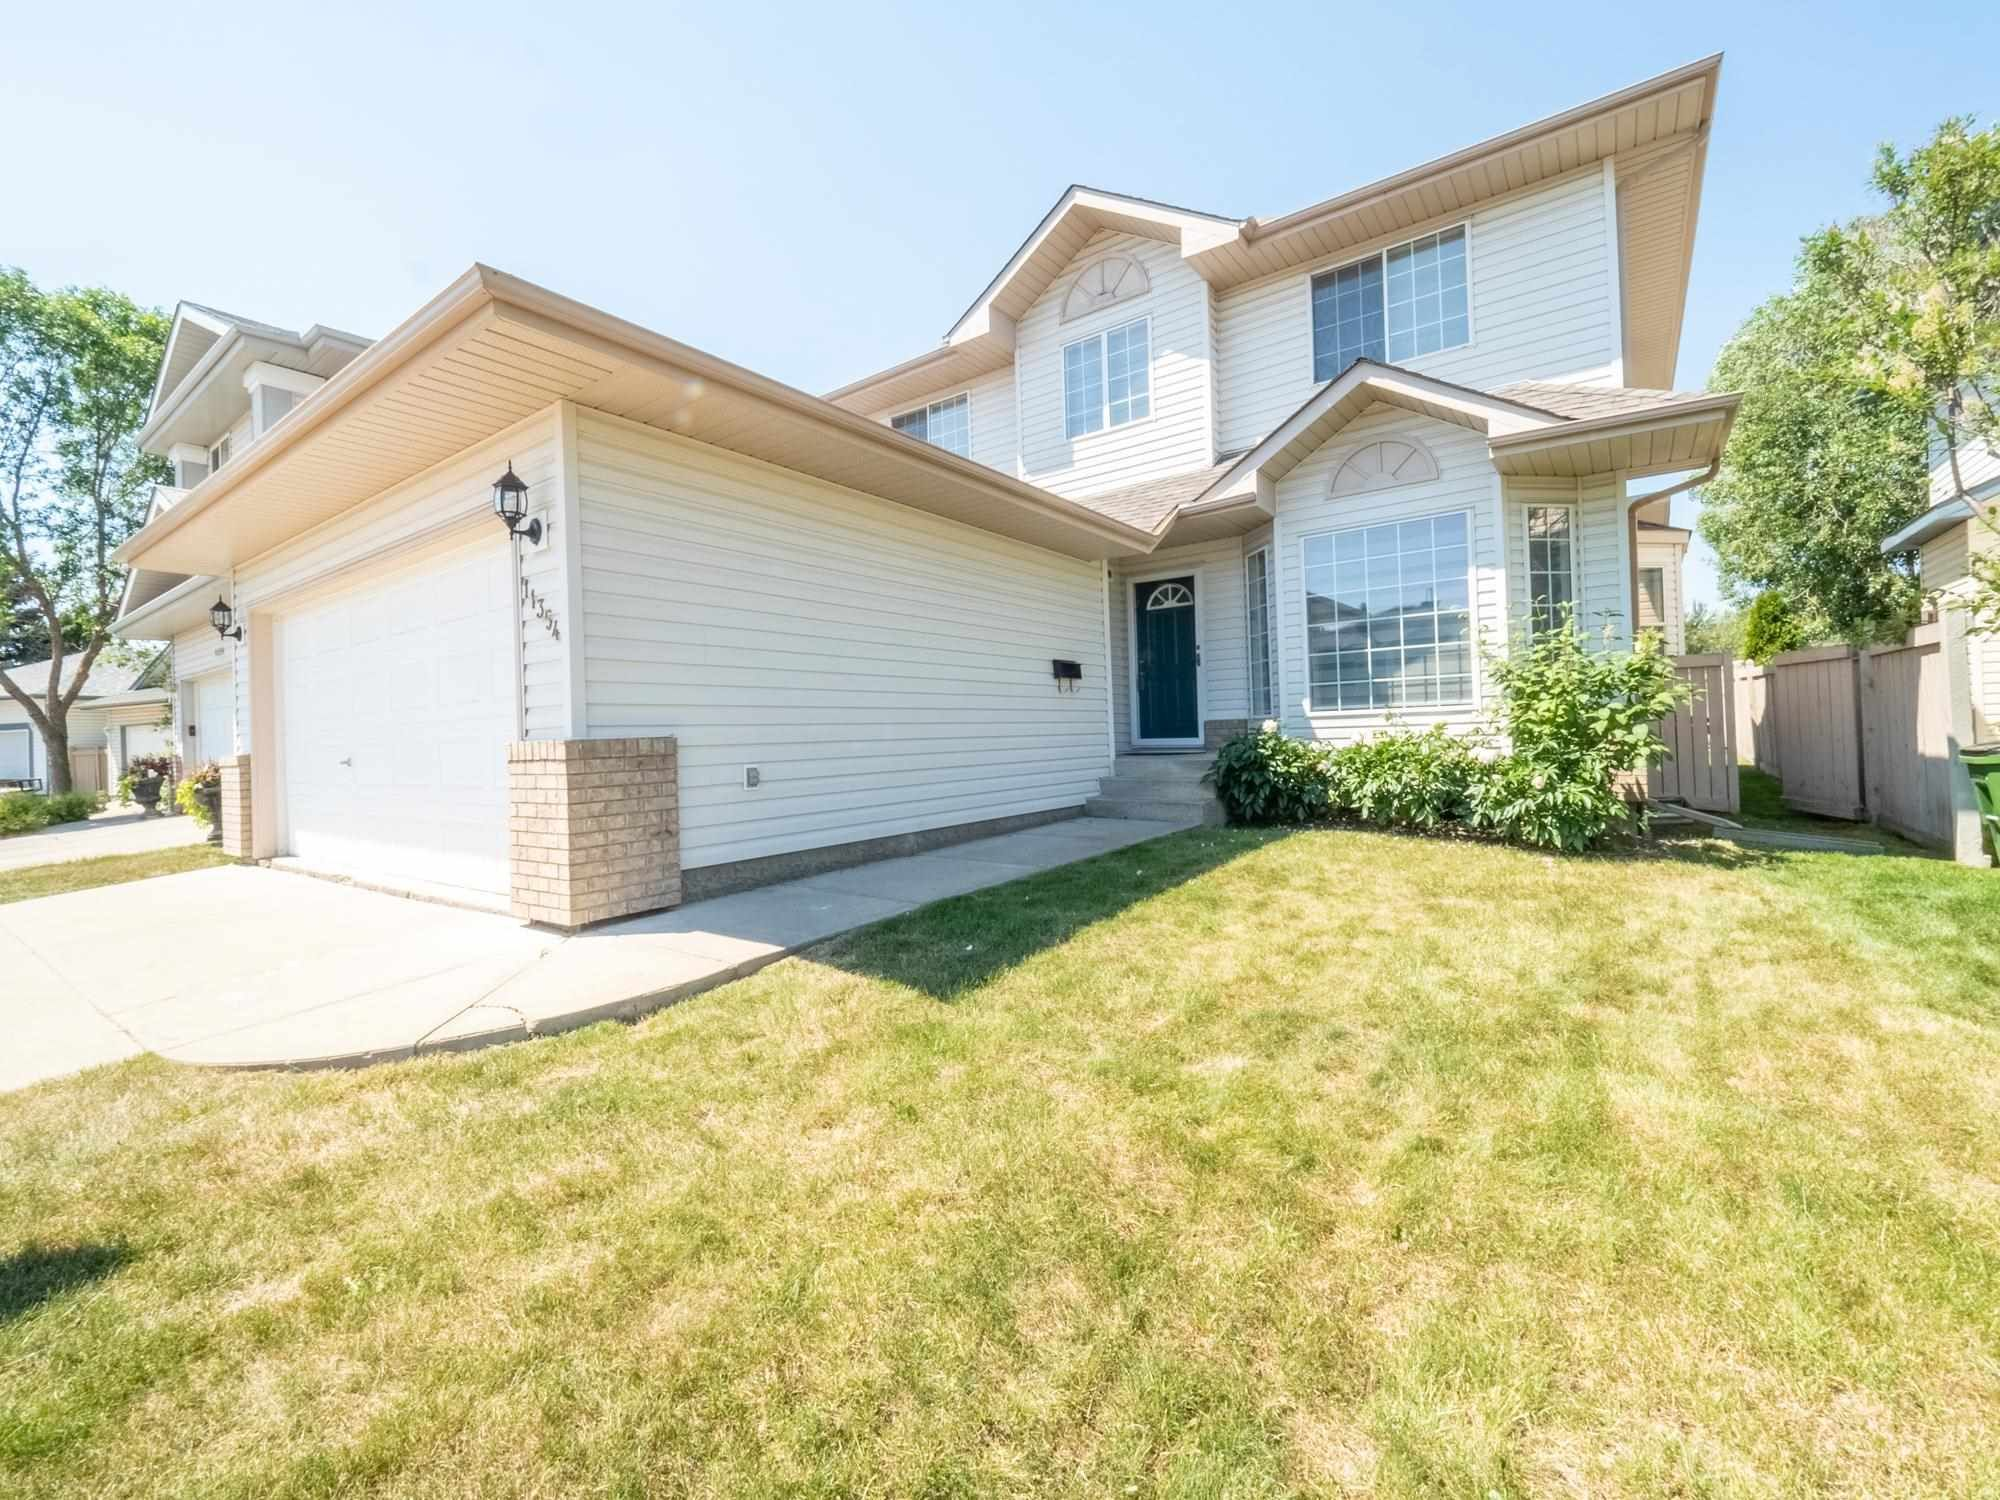 Main Photo: 11354 173 Avenue in Edmonton: Zone 27 House for sale : MLS®# E4253053